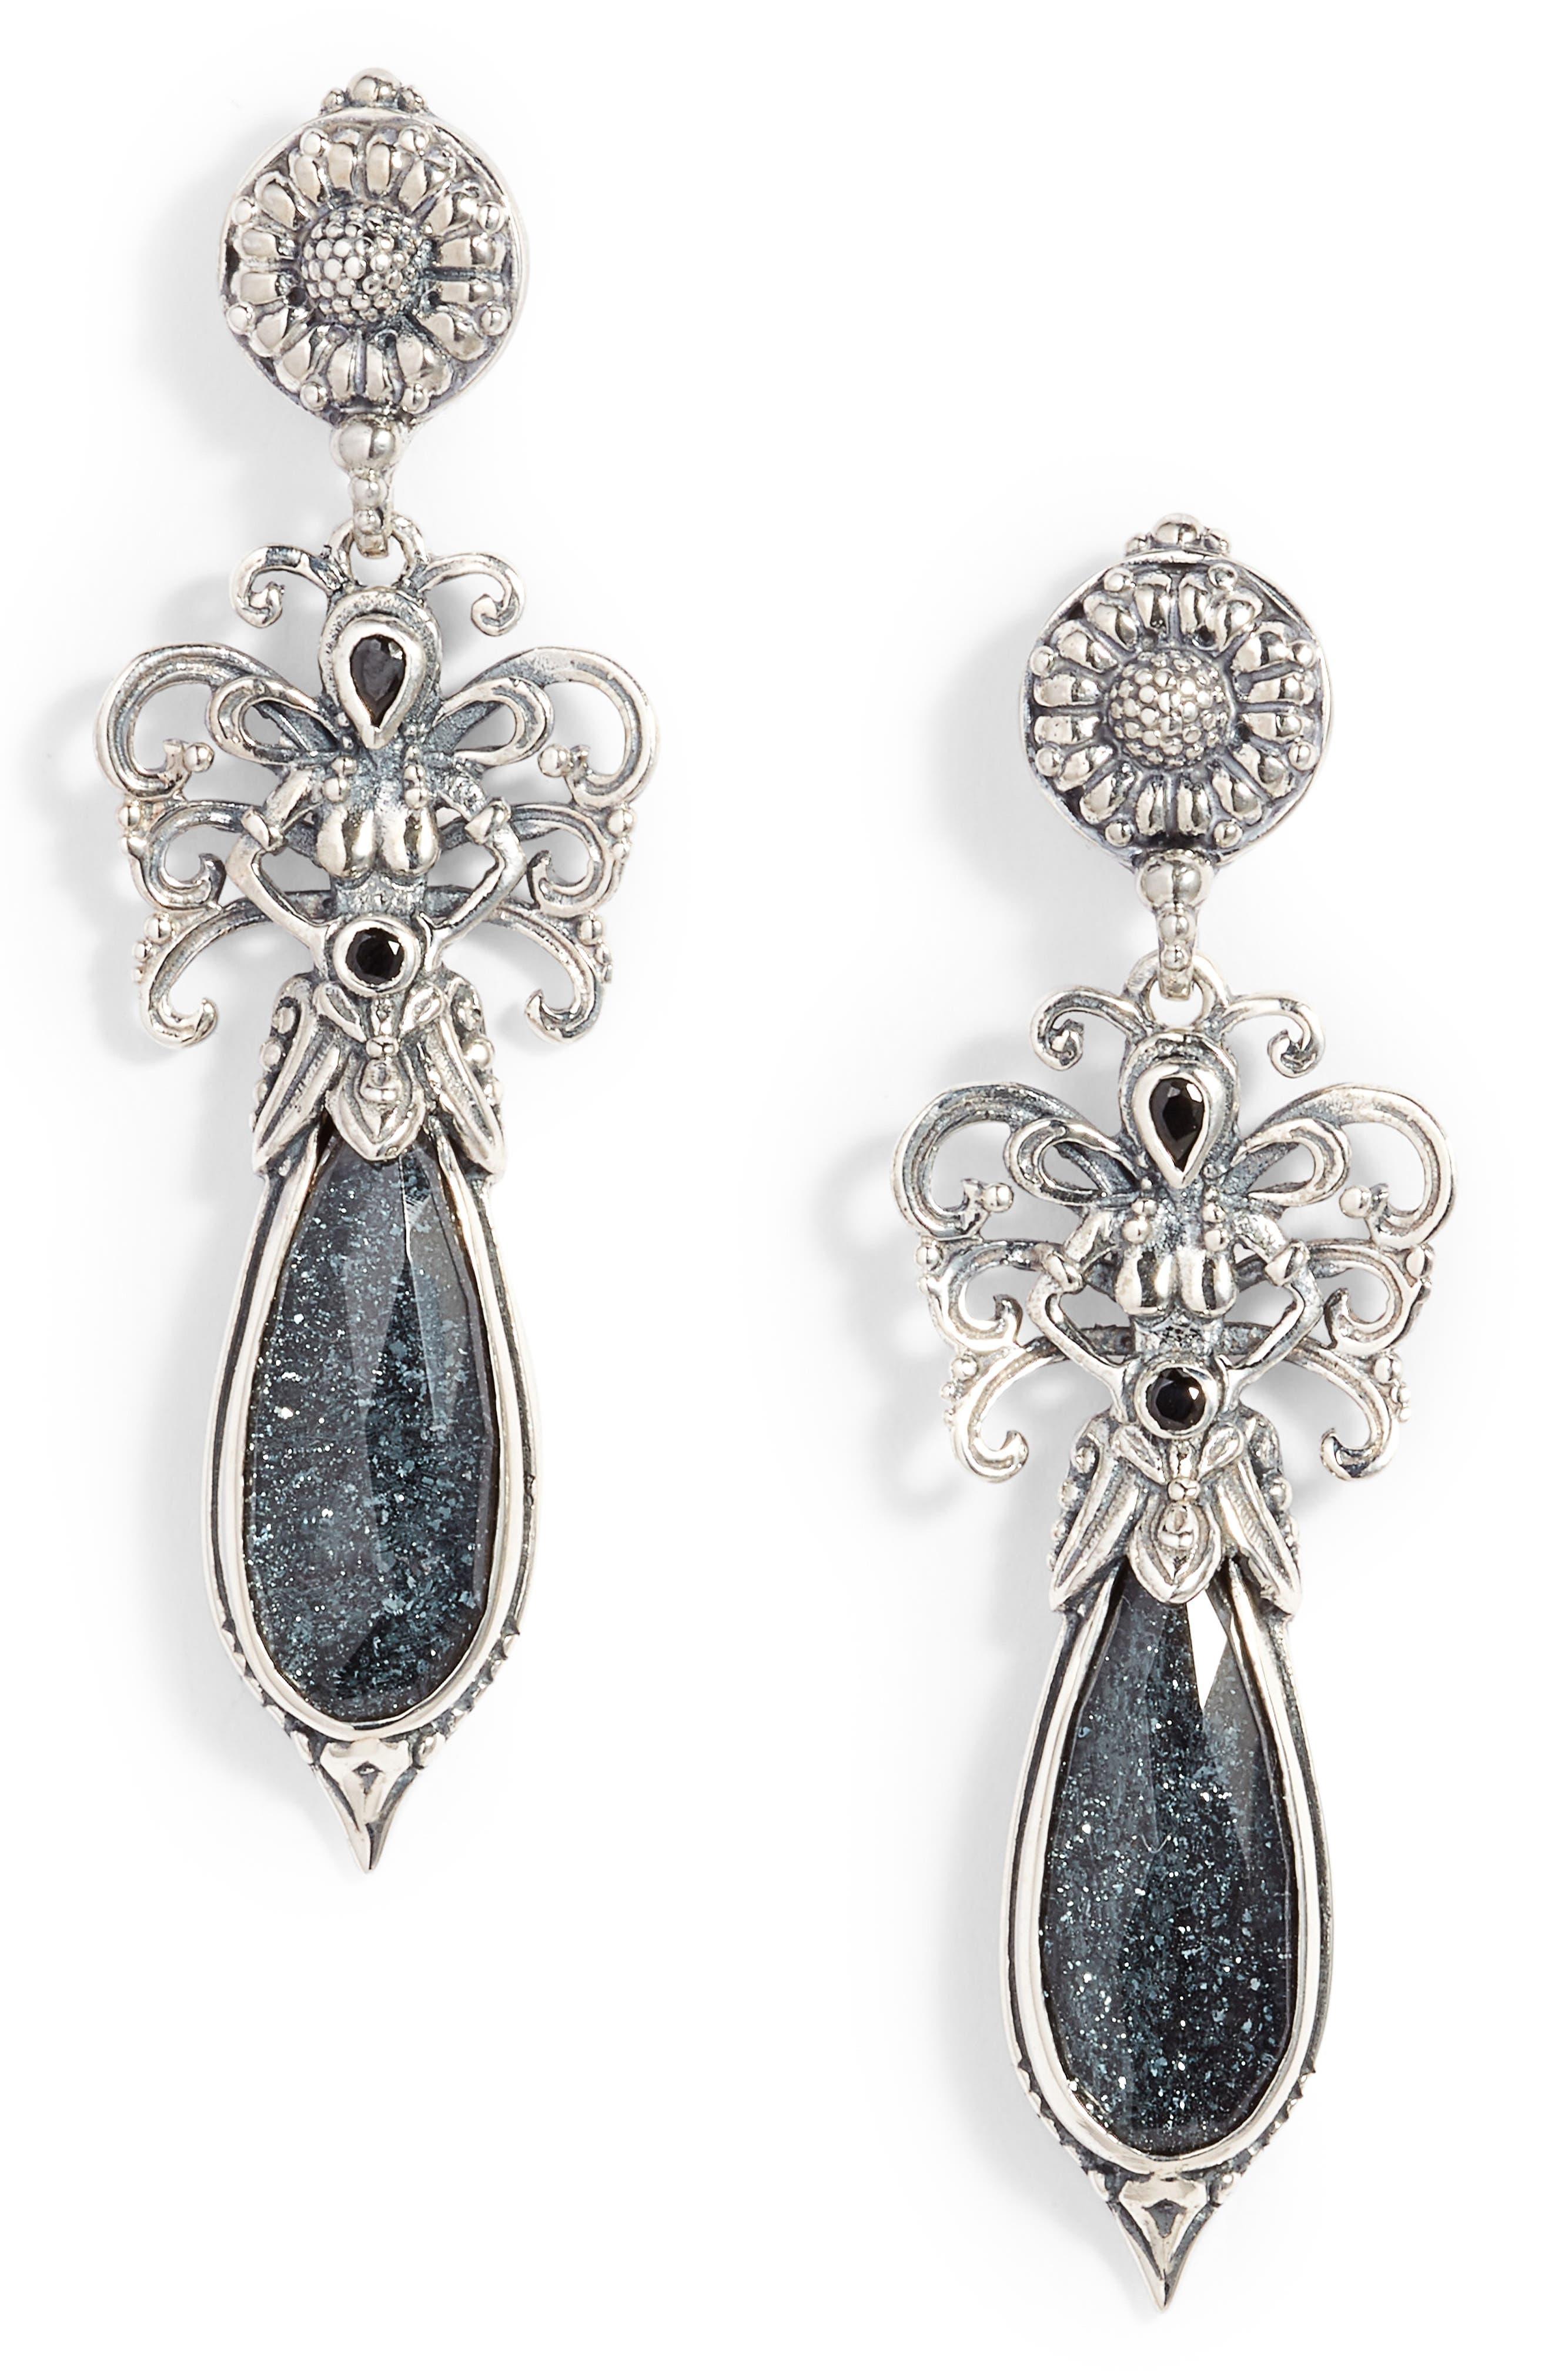 Santorini Spinel Drop Earrings,                         Main,                         color, SILVER/ HEMATITE